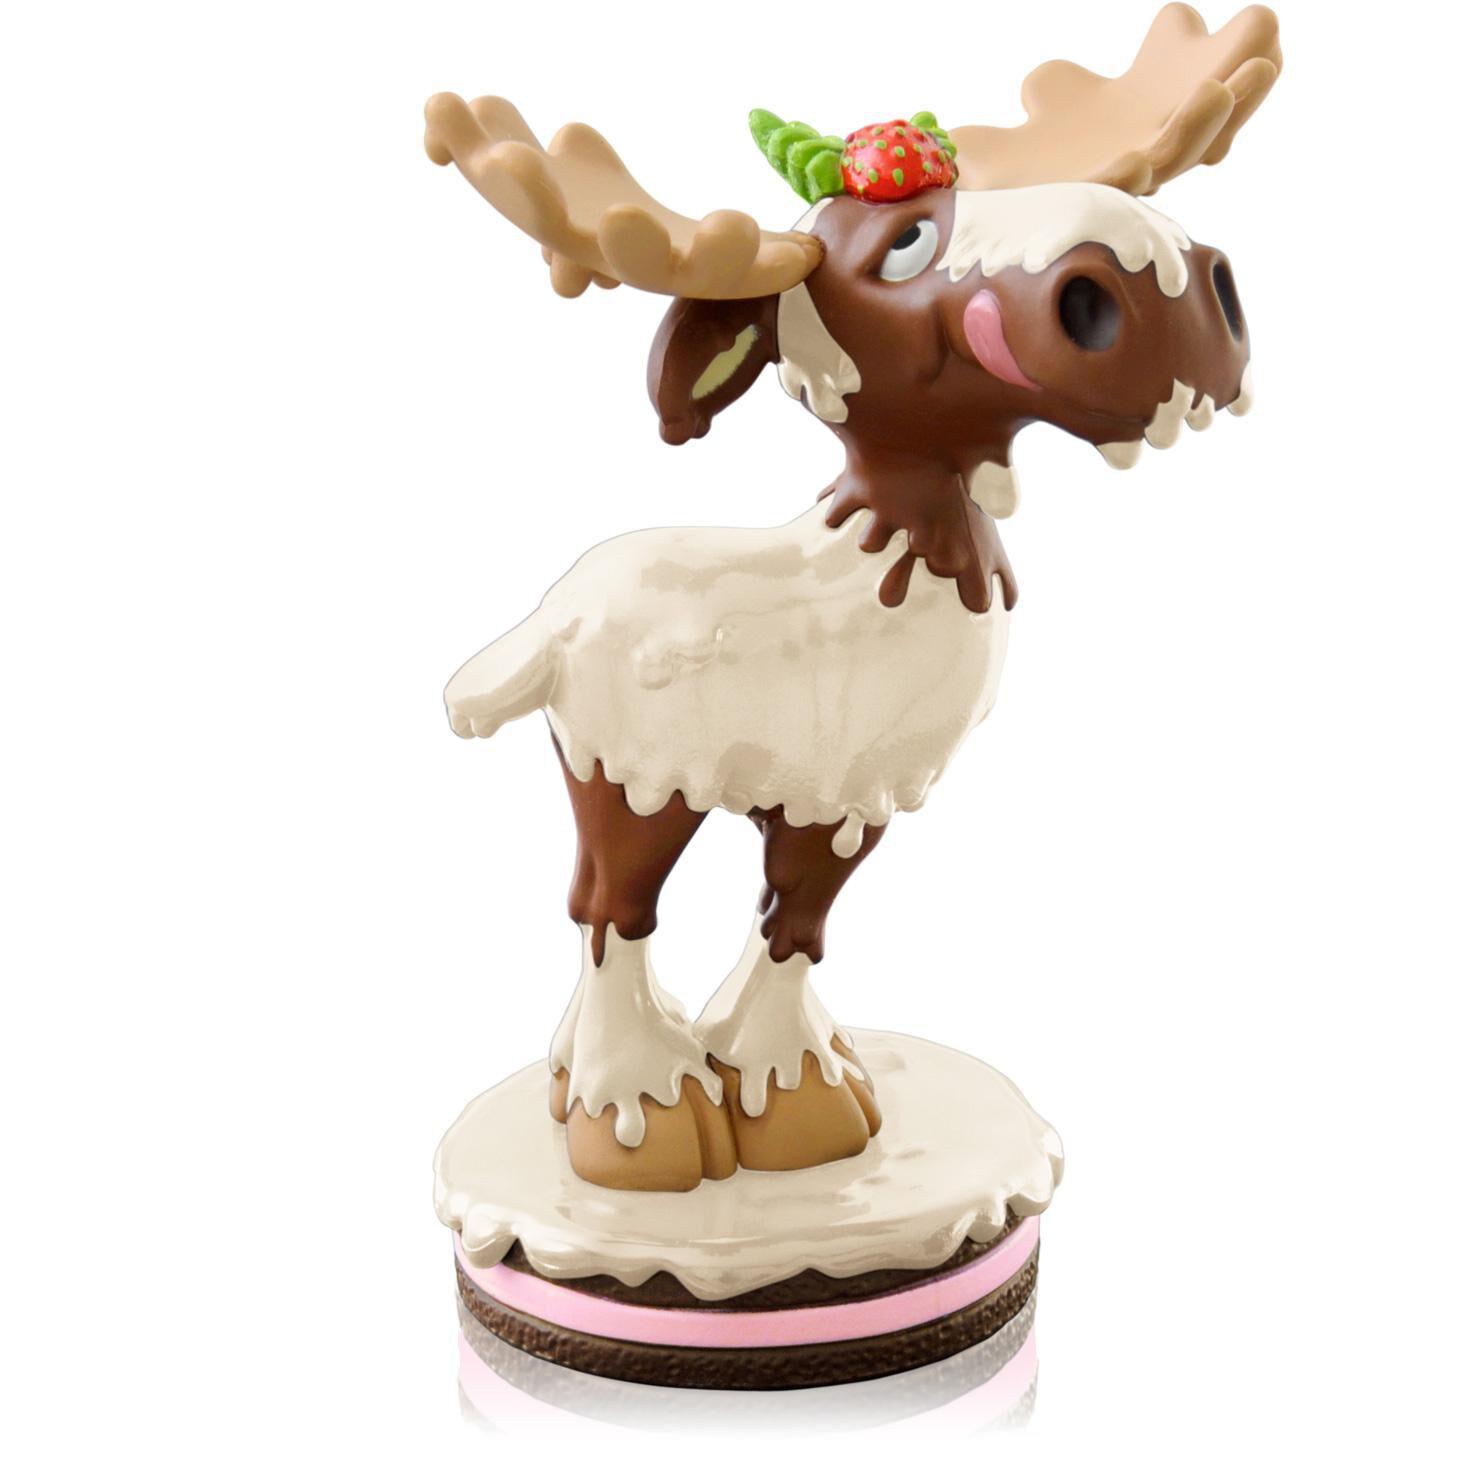 White Chocolate Moose - Keepsake Ornaments - Hallmark